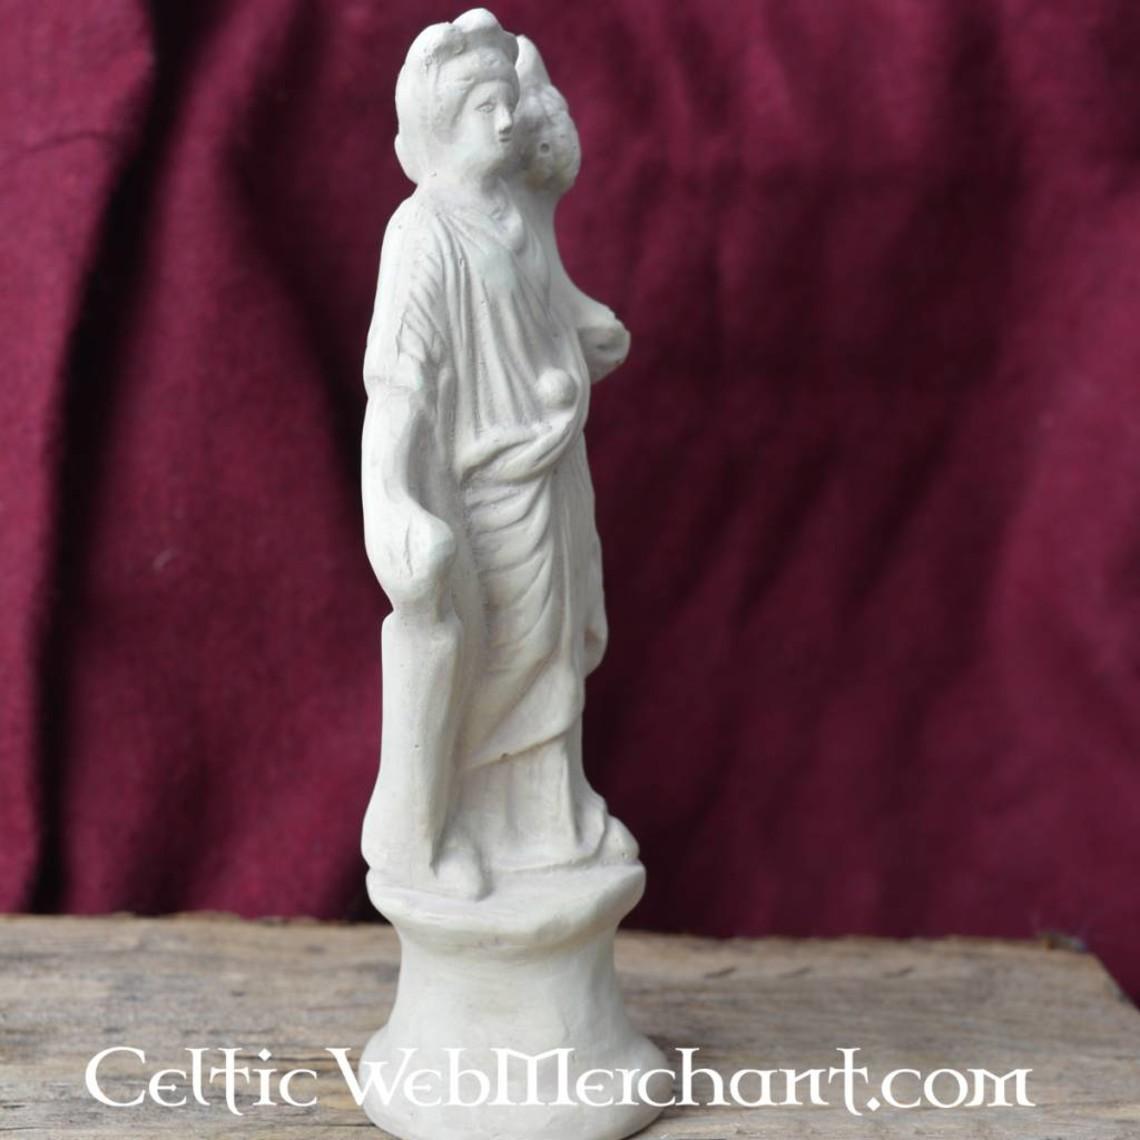 Statua votiva romana dea Fortuna